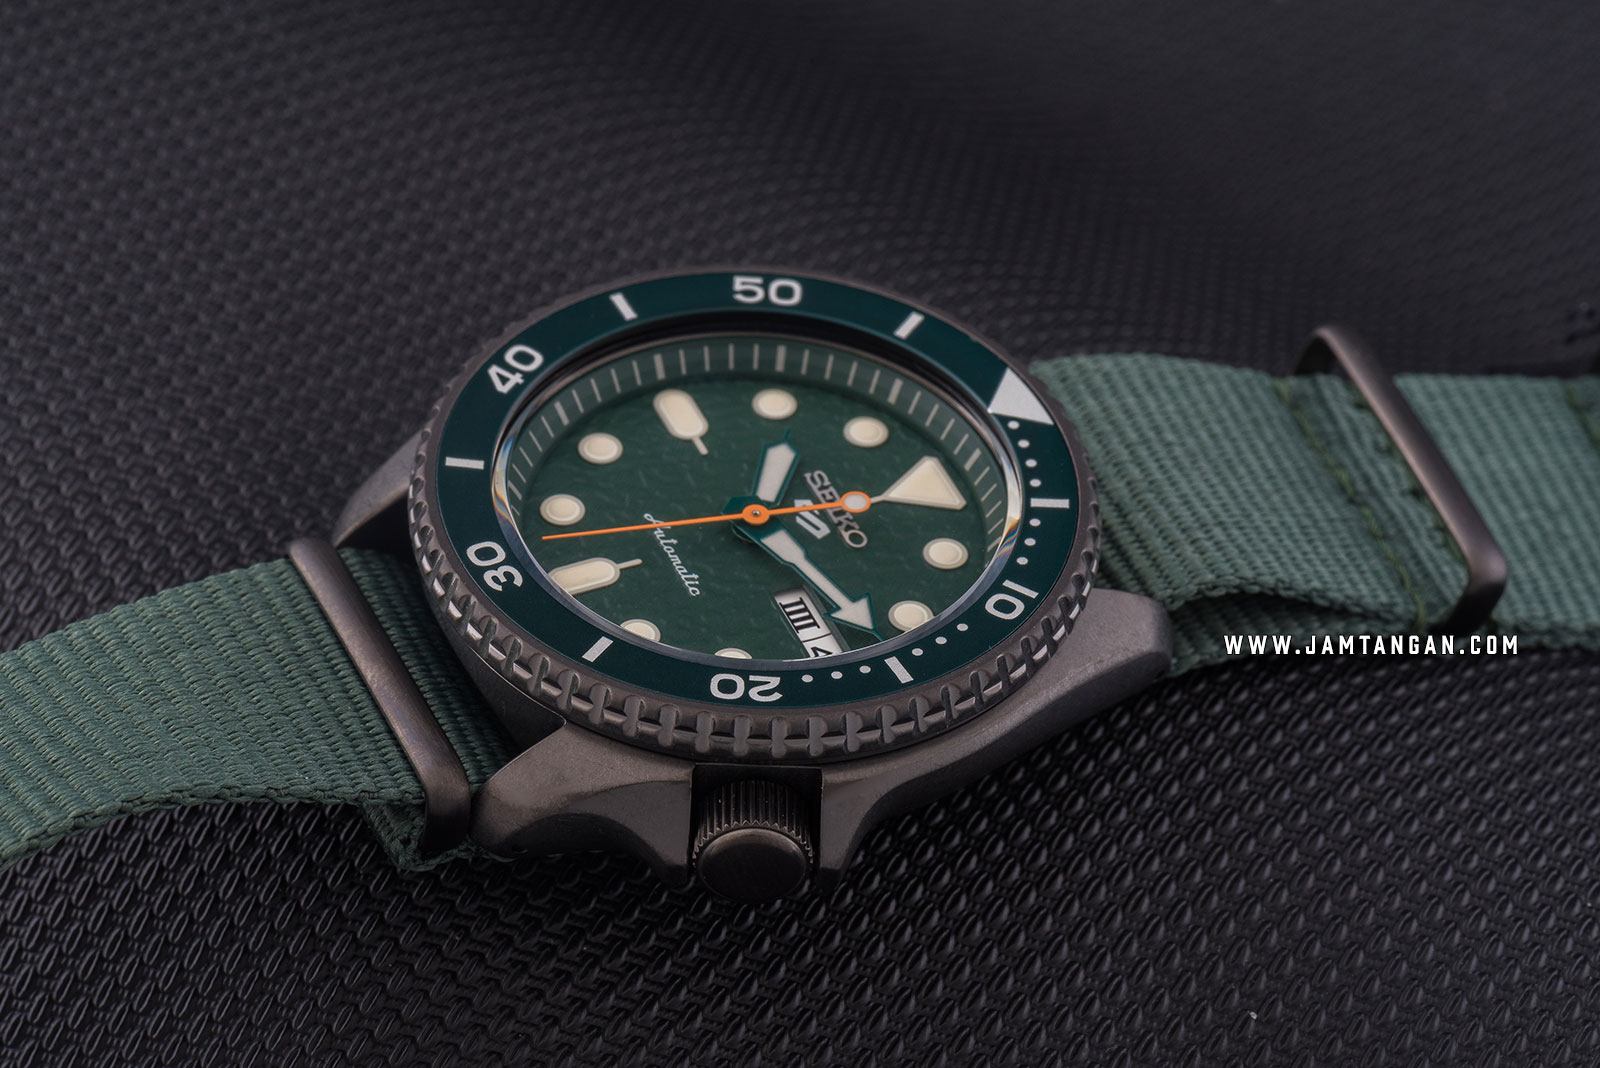 Seiko 5 Sports SRPD77K1 Automatic Green Dial Green Nylon Strap Machtwatch